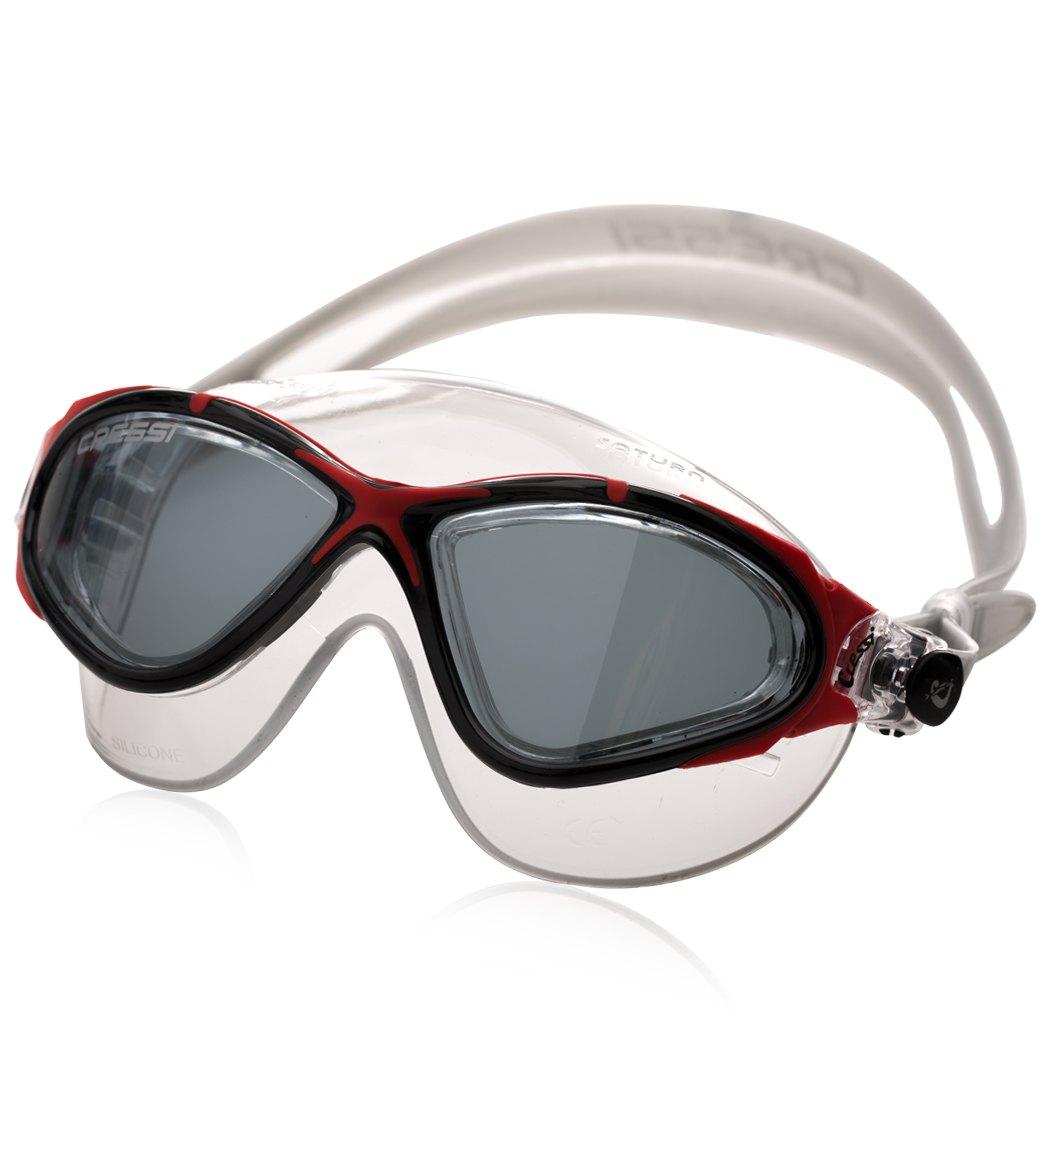 ab4216d2b0d Cressi Saturn Crystal Swim Mask Tinted Lens at SwimOutlet.com